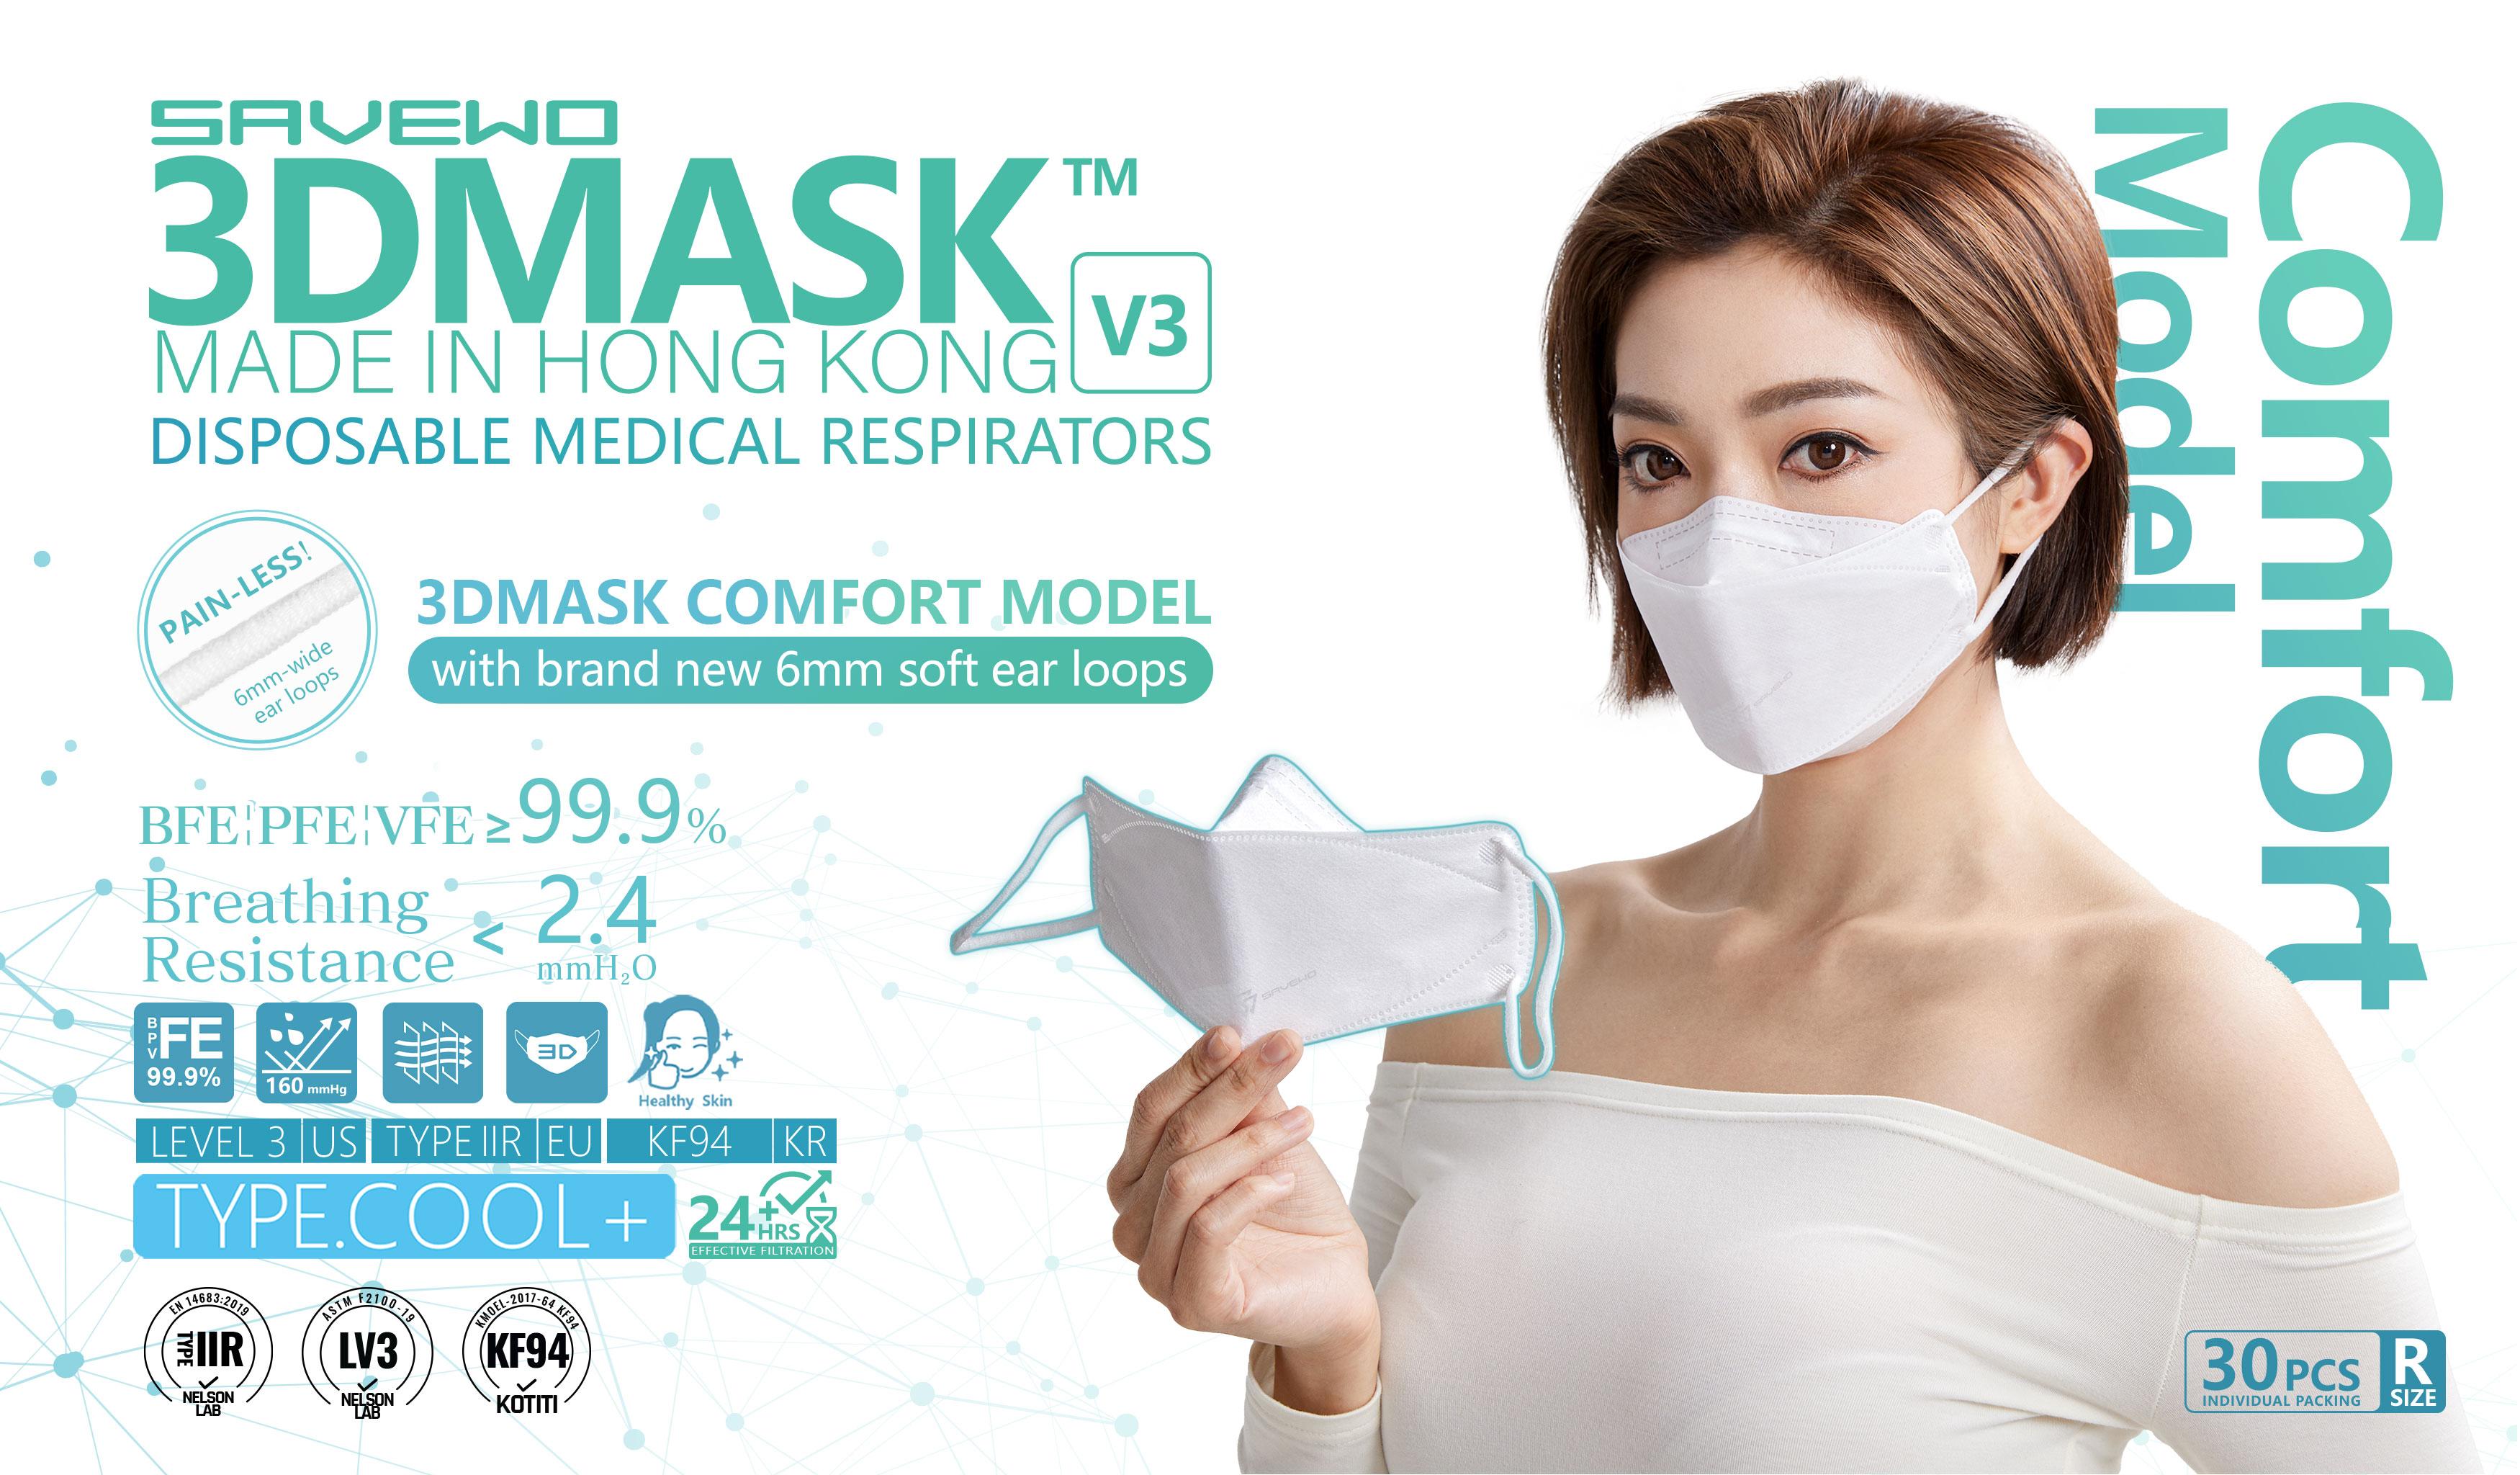 mask-sav-v3-1.jpg